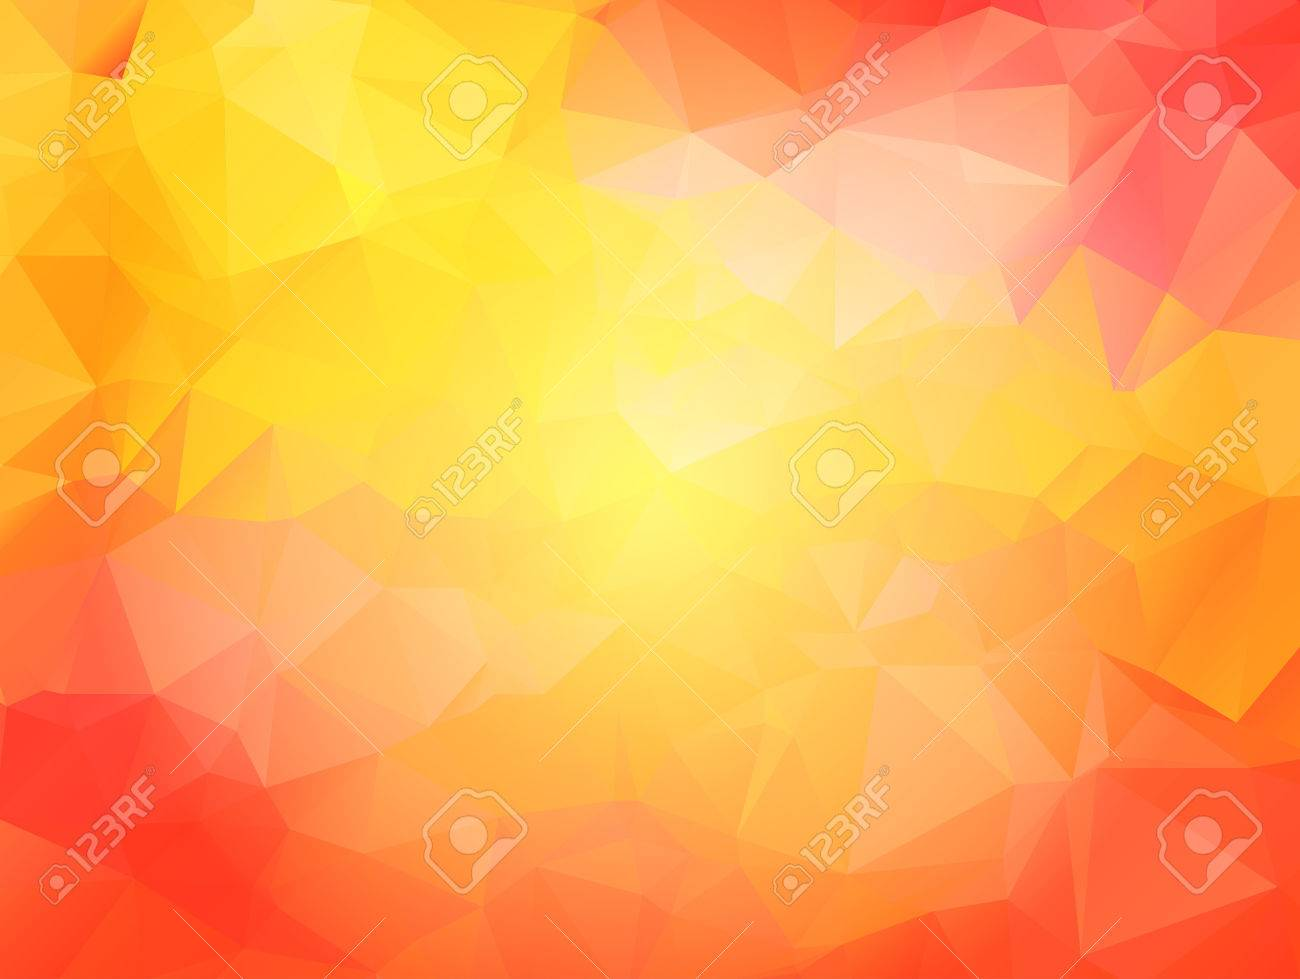 Polygonal Mosaic Background, Vector illustration, Business Design Templates - 40527555